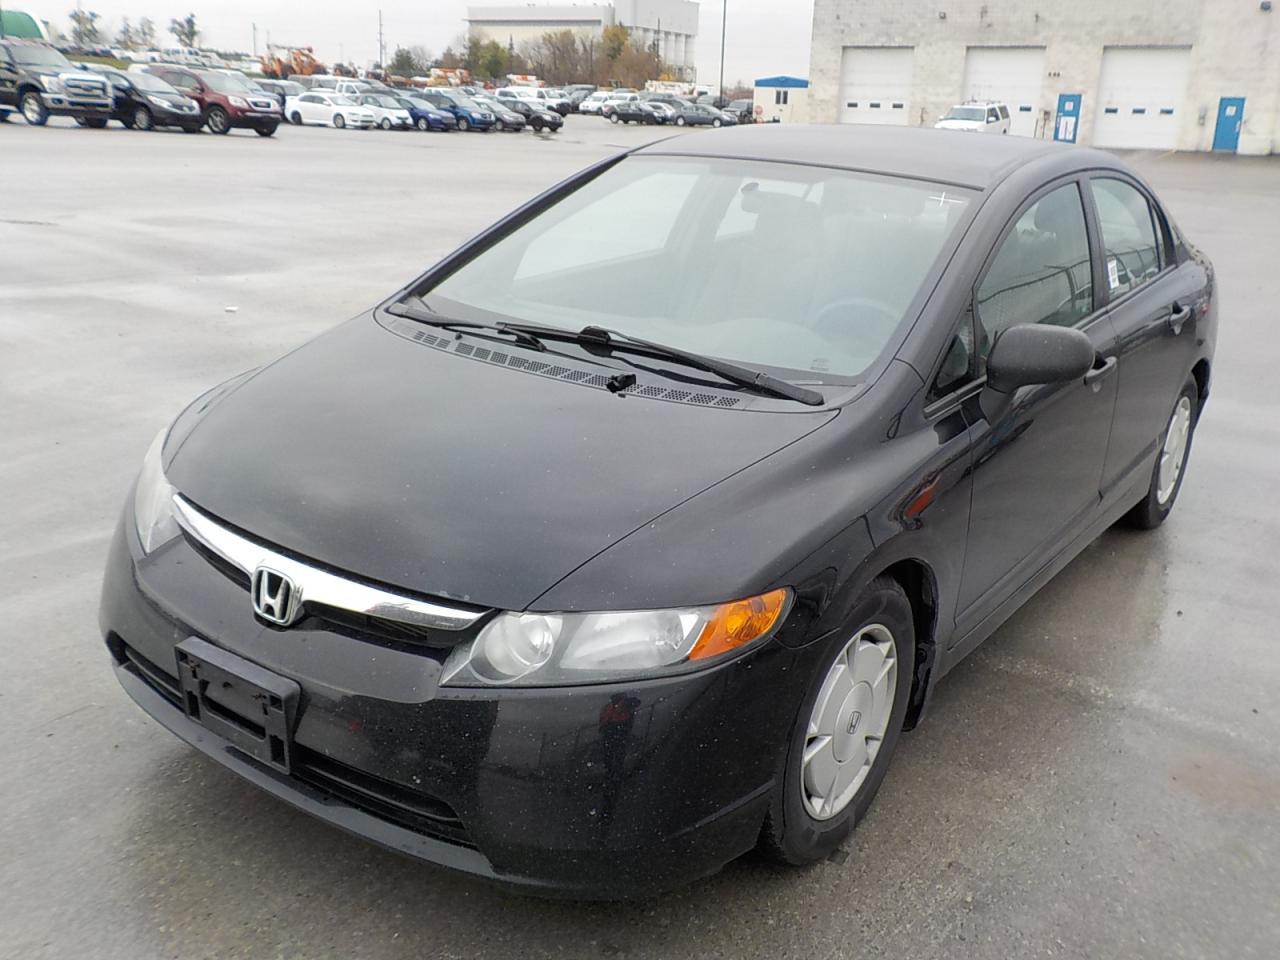 Photo of Black 2008 Honda Civic